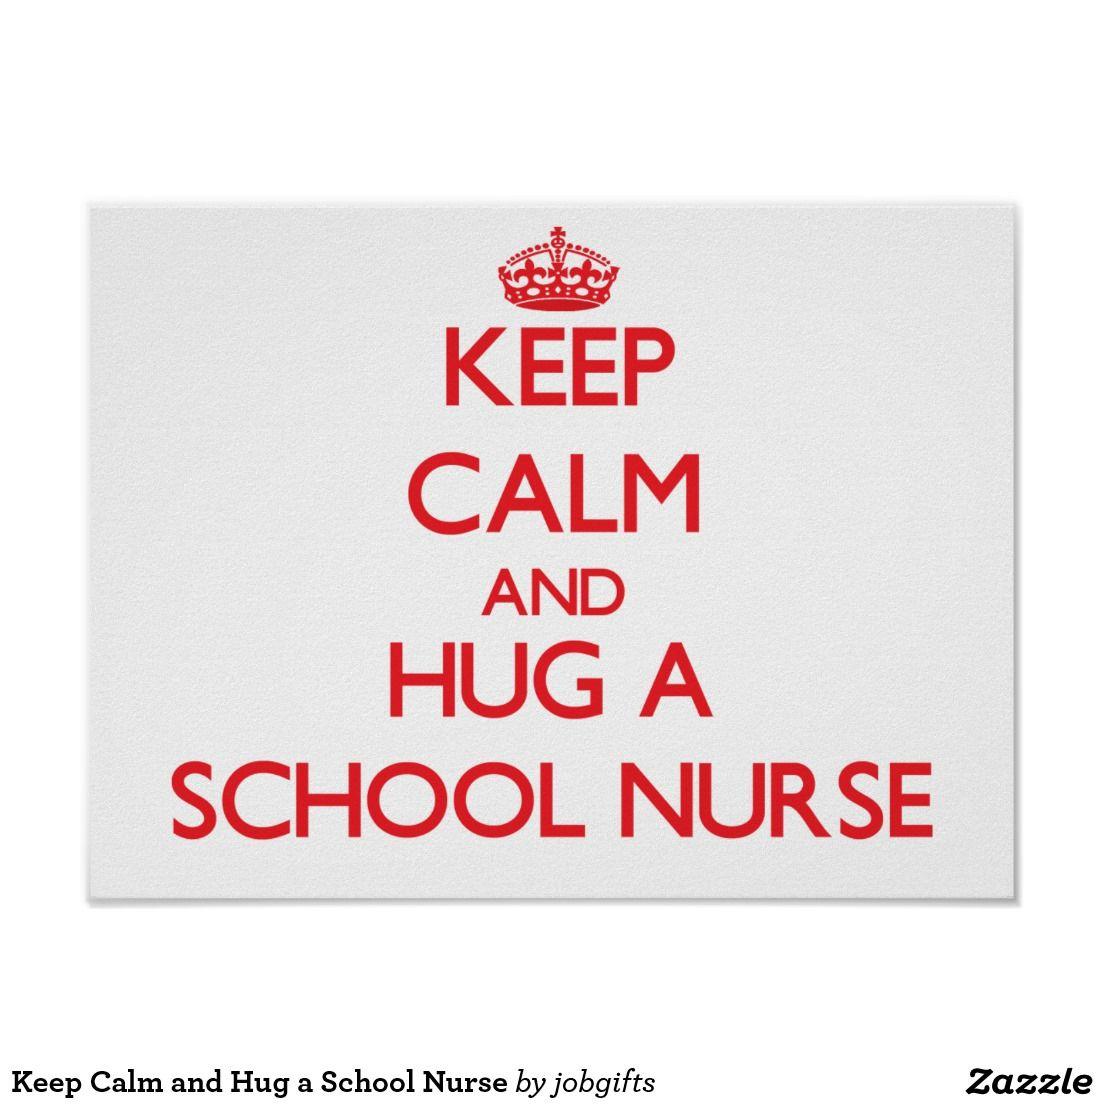 Keep calm and hug a school nurse poster